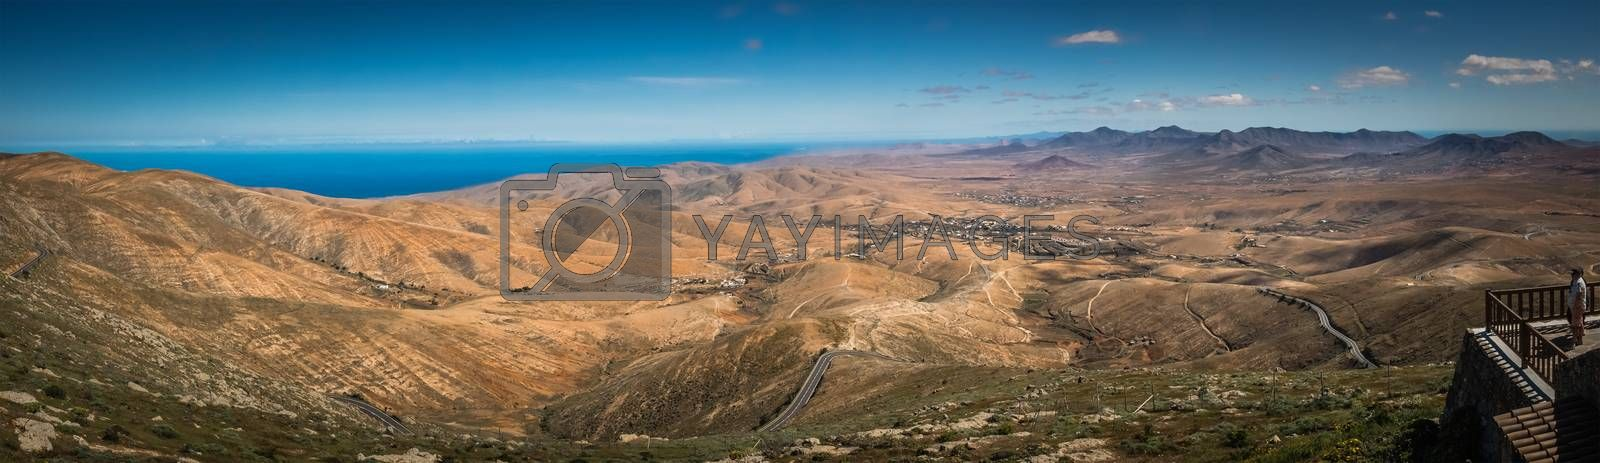 Royalty free image of Fuerteventura panorama by pawopa3336